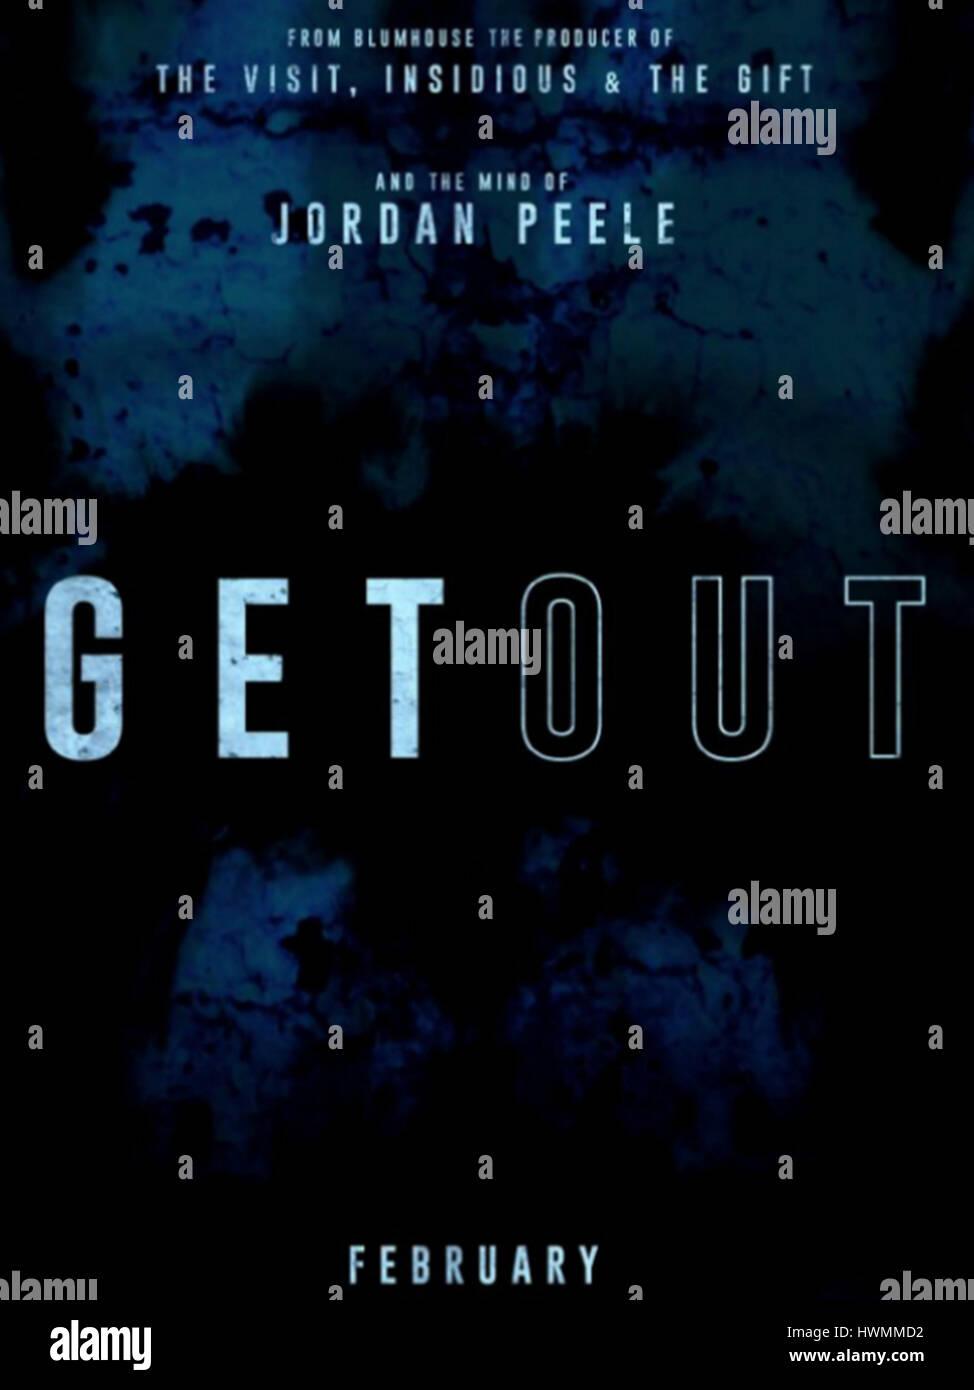 GET OUT (2017) JORDAN PEELE (DIR) WARNER BROS/MOVIESTORE COLLECTION LTD - Stock Image